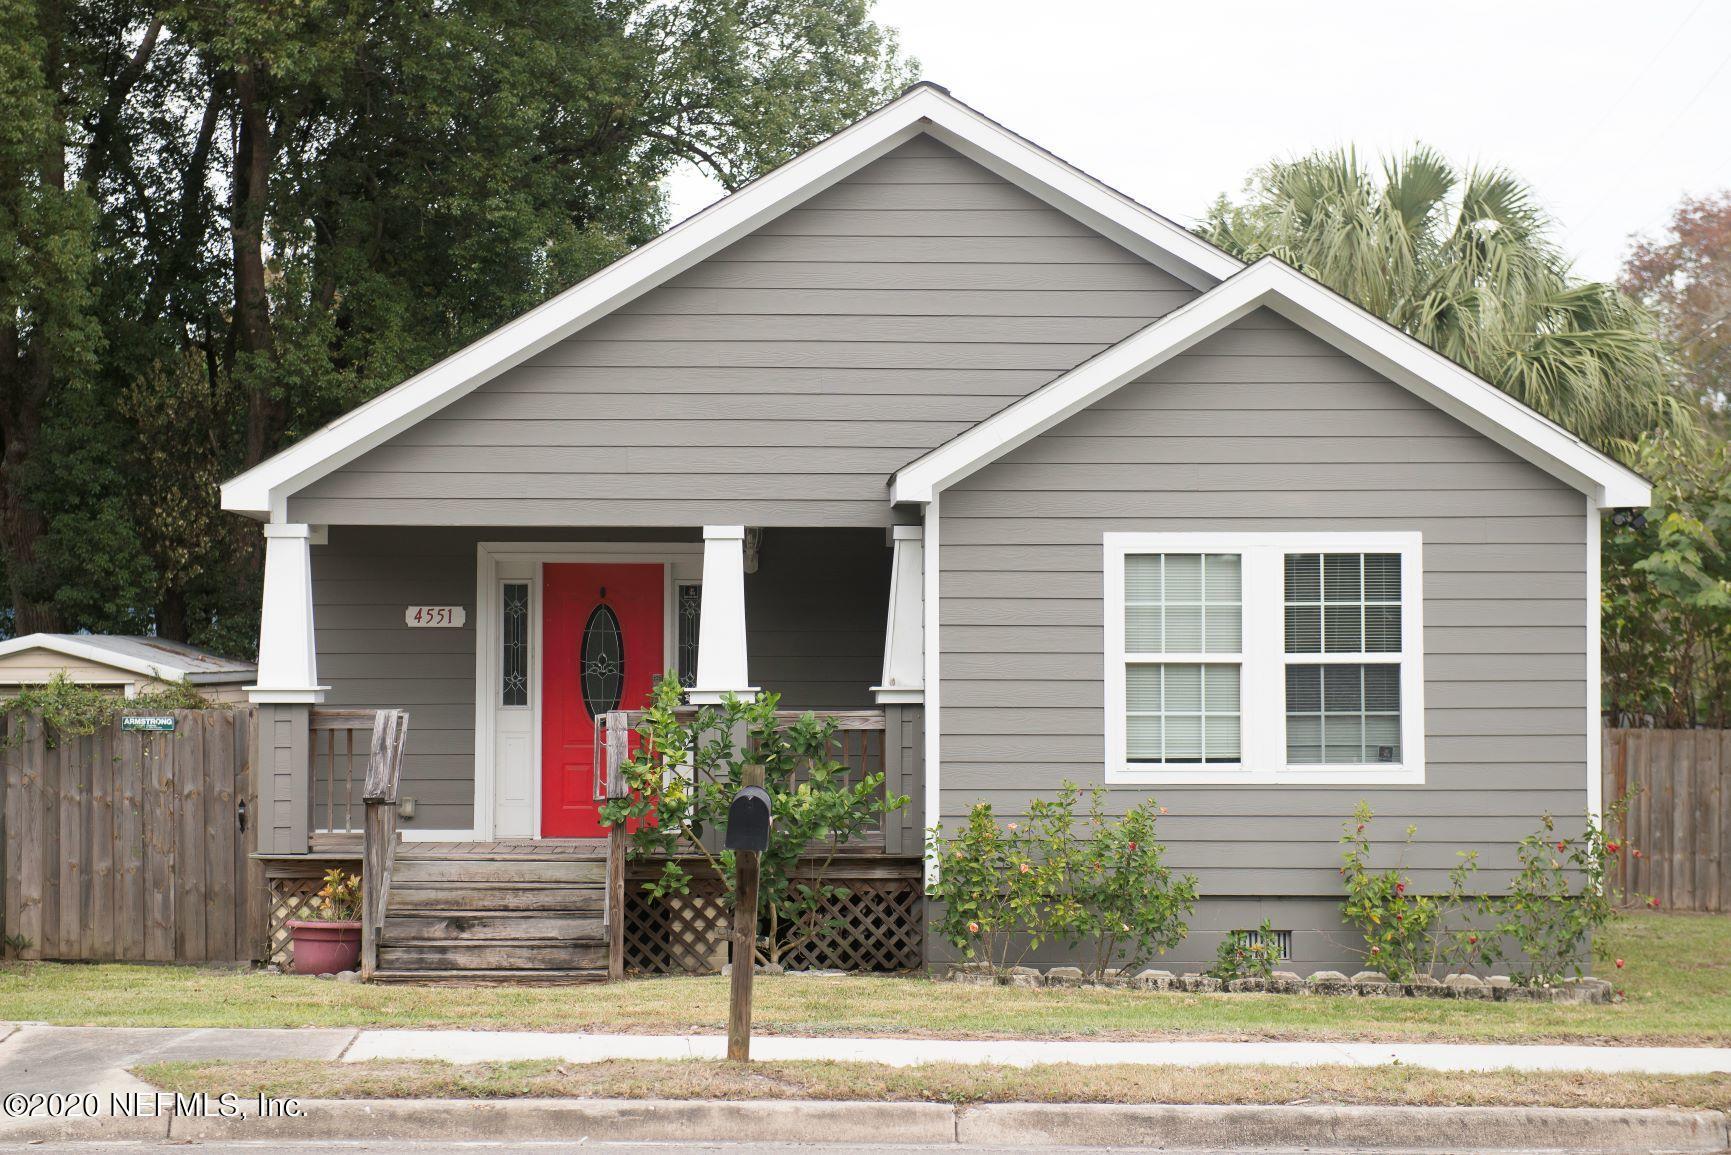 4551 PARK ST, JACKSONVILLE, Florida 32205, 3 Bedrooms Bedrooms, ,2 BathroomsBathrooms,Single Family,For Sale,4551 PARK ST,1087168